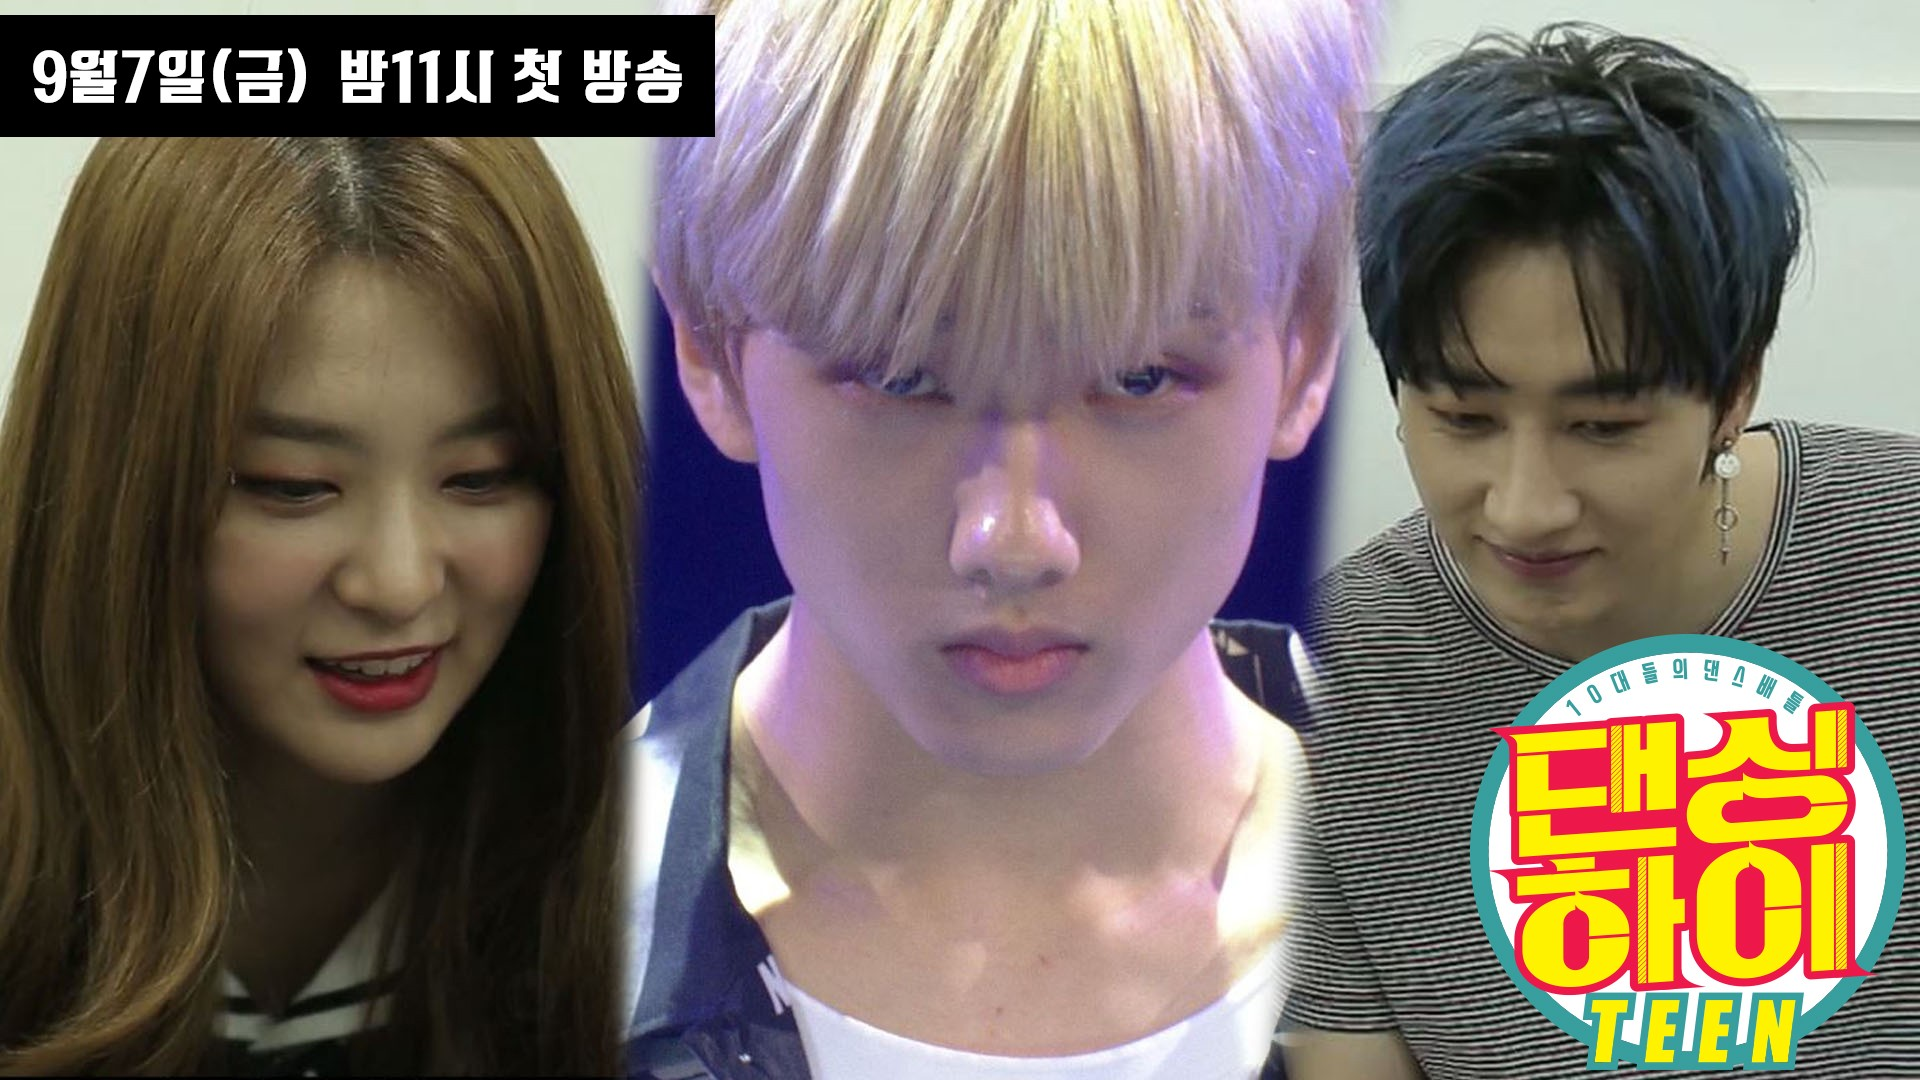 *V-original*[댄싱하이 비긴즈] 지성 무대를 본 슈주,레드벨벳 선배들의 반응은? (9/7 첫 방송!) / Dancinghigh Begins #6